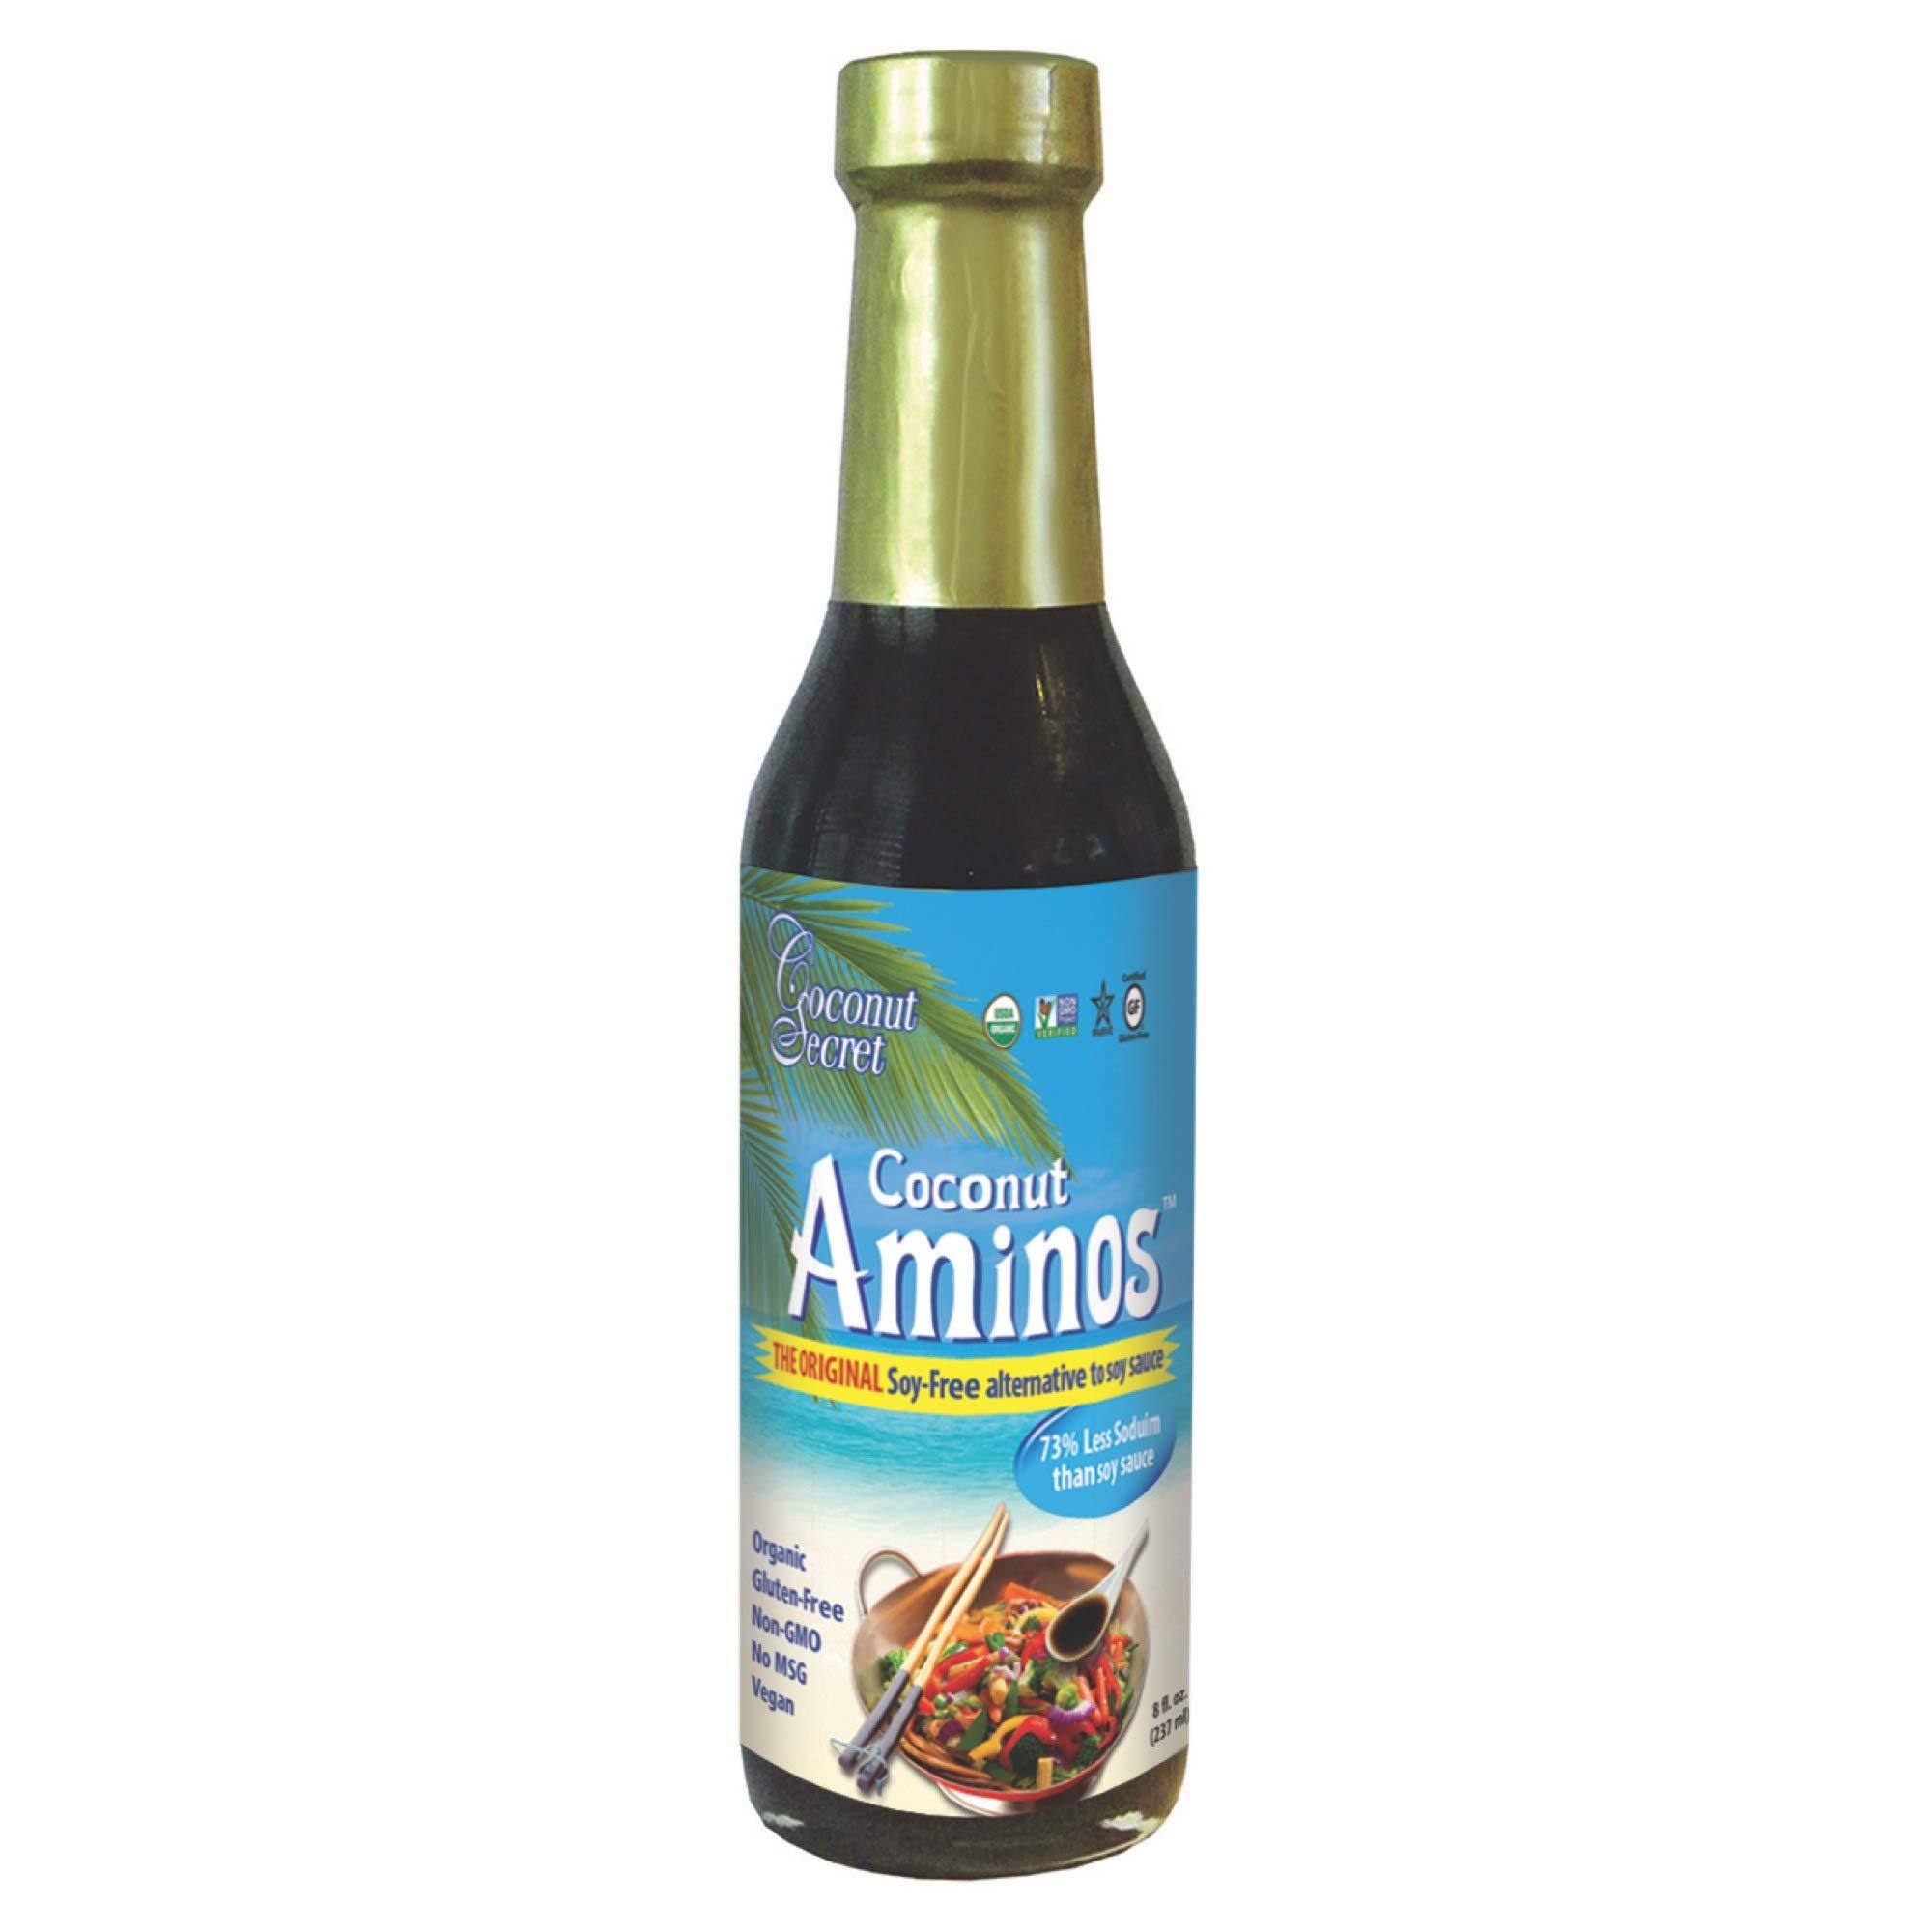 Coconut Secret Coconut Aminos (3 Pack) - 8 fl oz - Low Sodium Soy Sauce Alternative, Low-Glycemic - Organic, Vegan, Non-GMO, Gluten-Free, Kosher - Keto, Paleo - 144 Total Servings by COCONUT SECRET